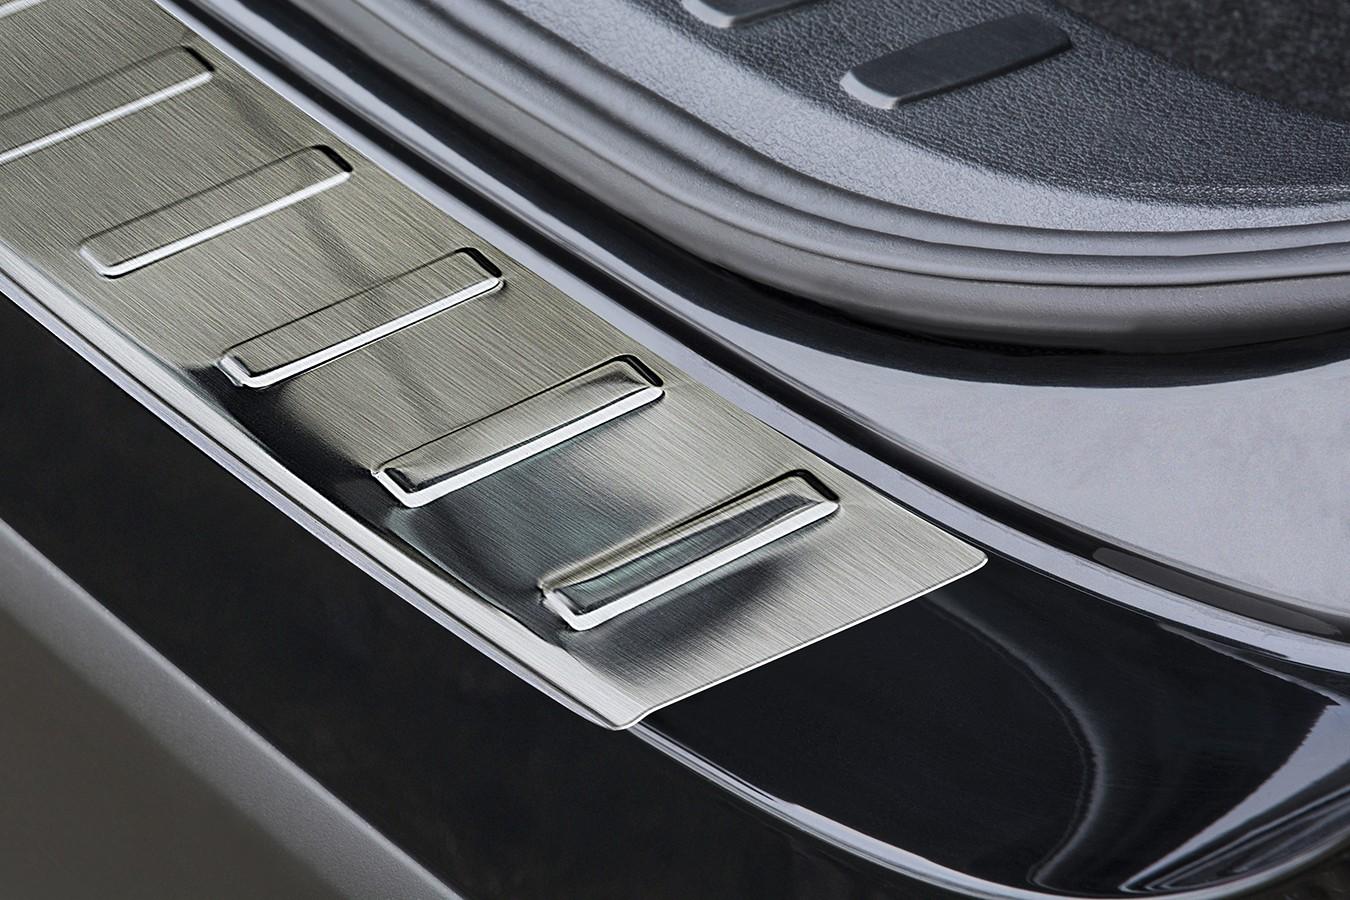 BMW X1 E84 5D profiled ribs 2009-2012